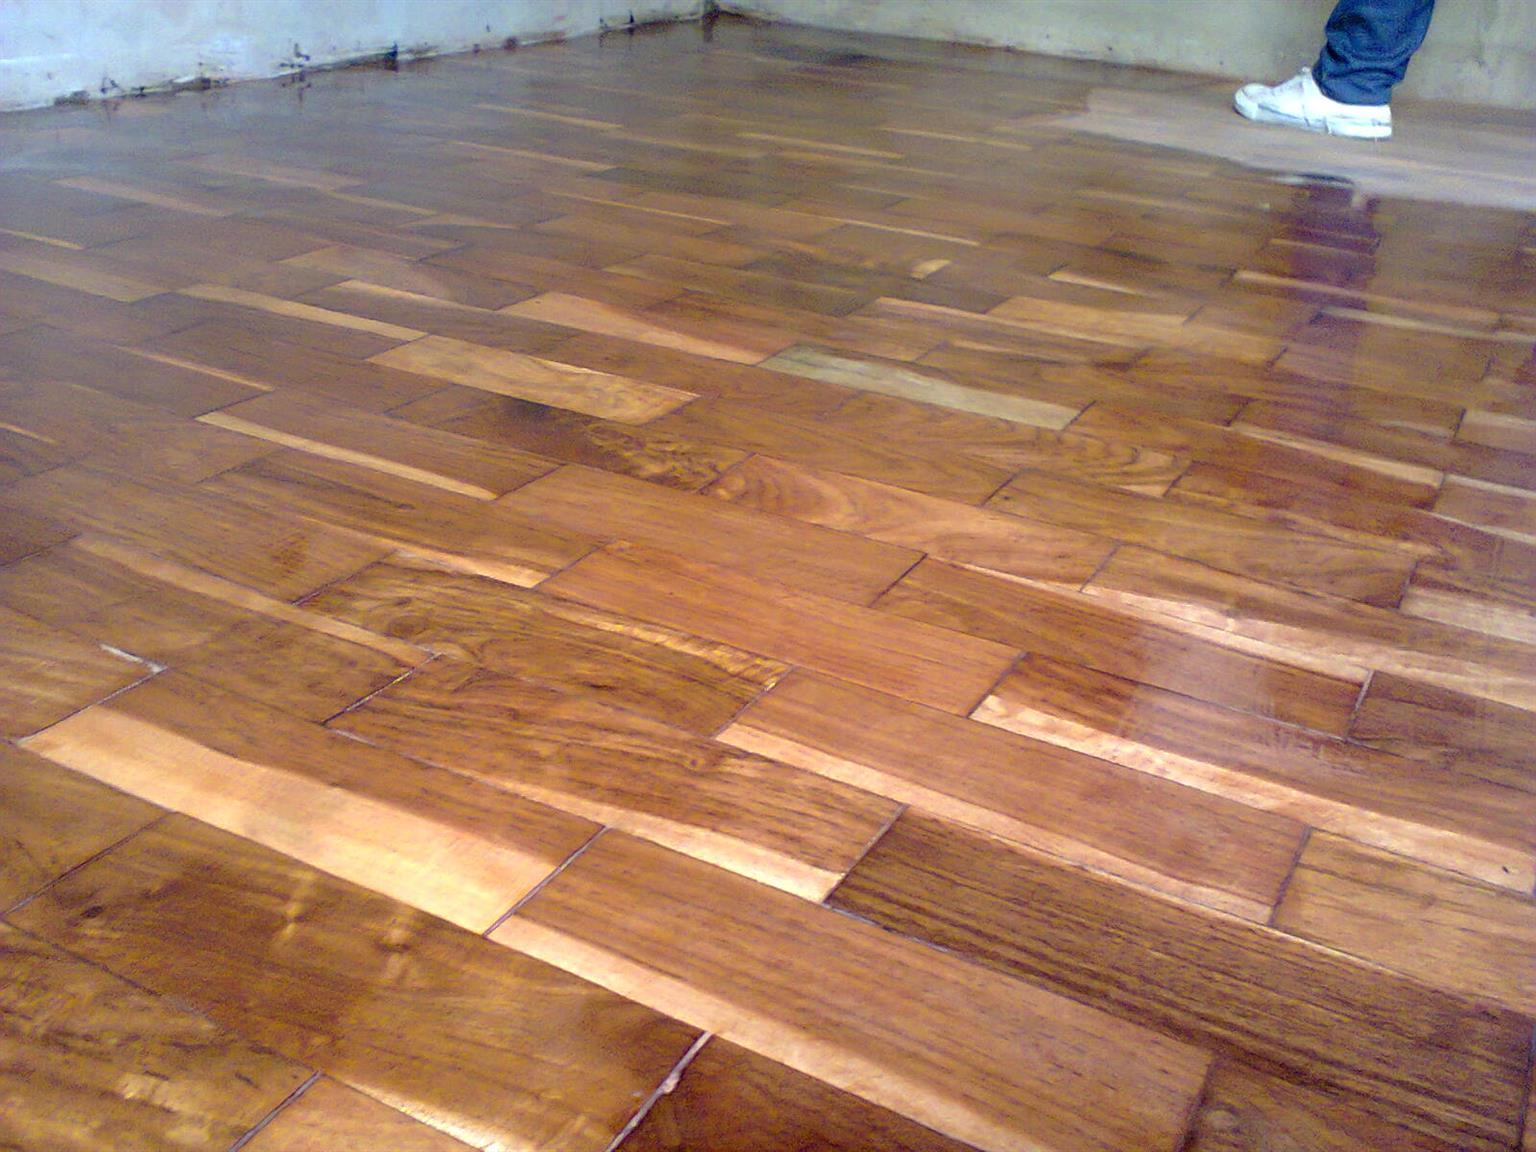 Wooden Flooring Parquet Floors Sanding And Sealing Junk Mail